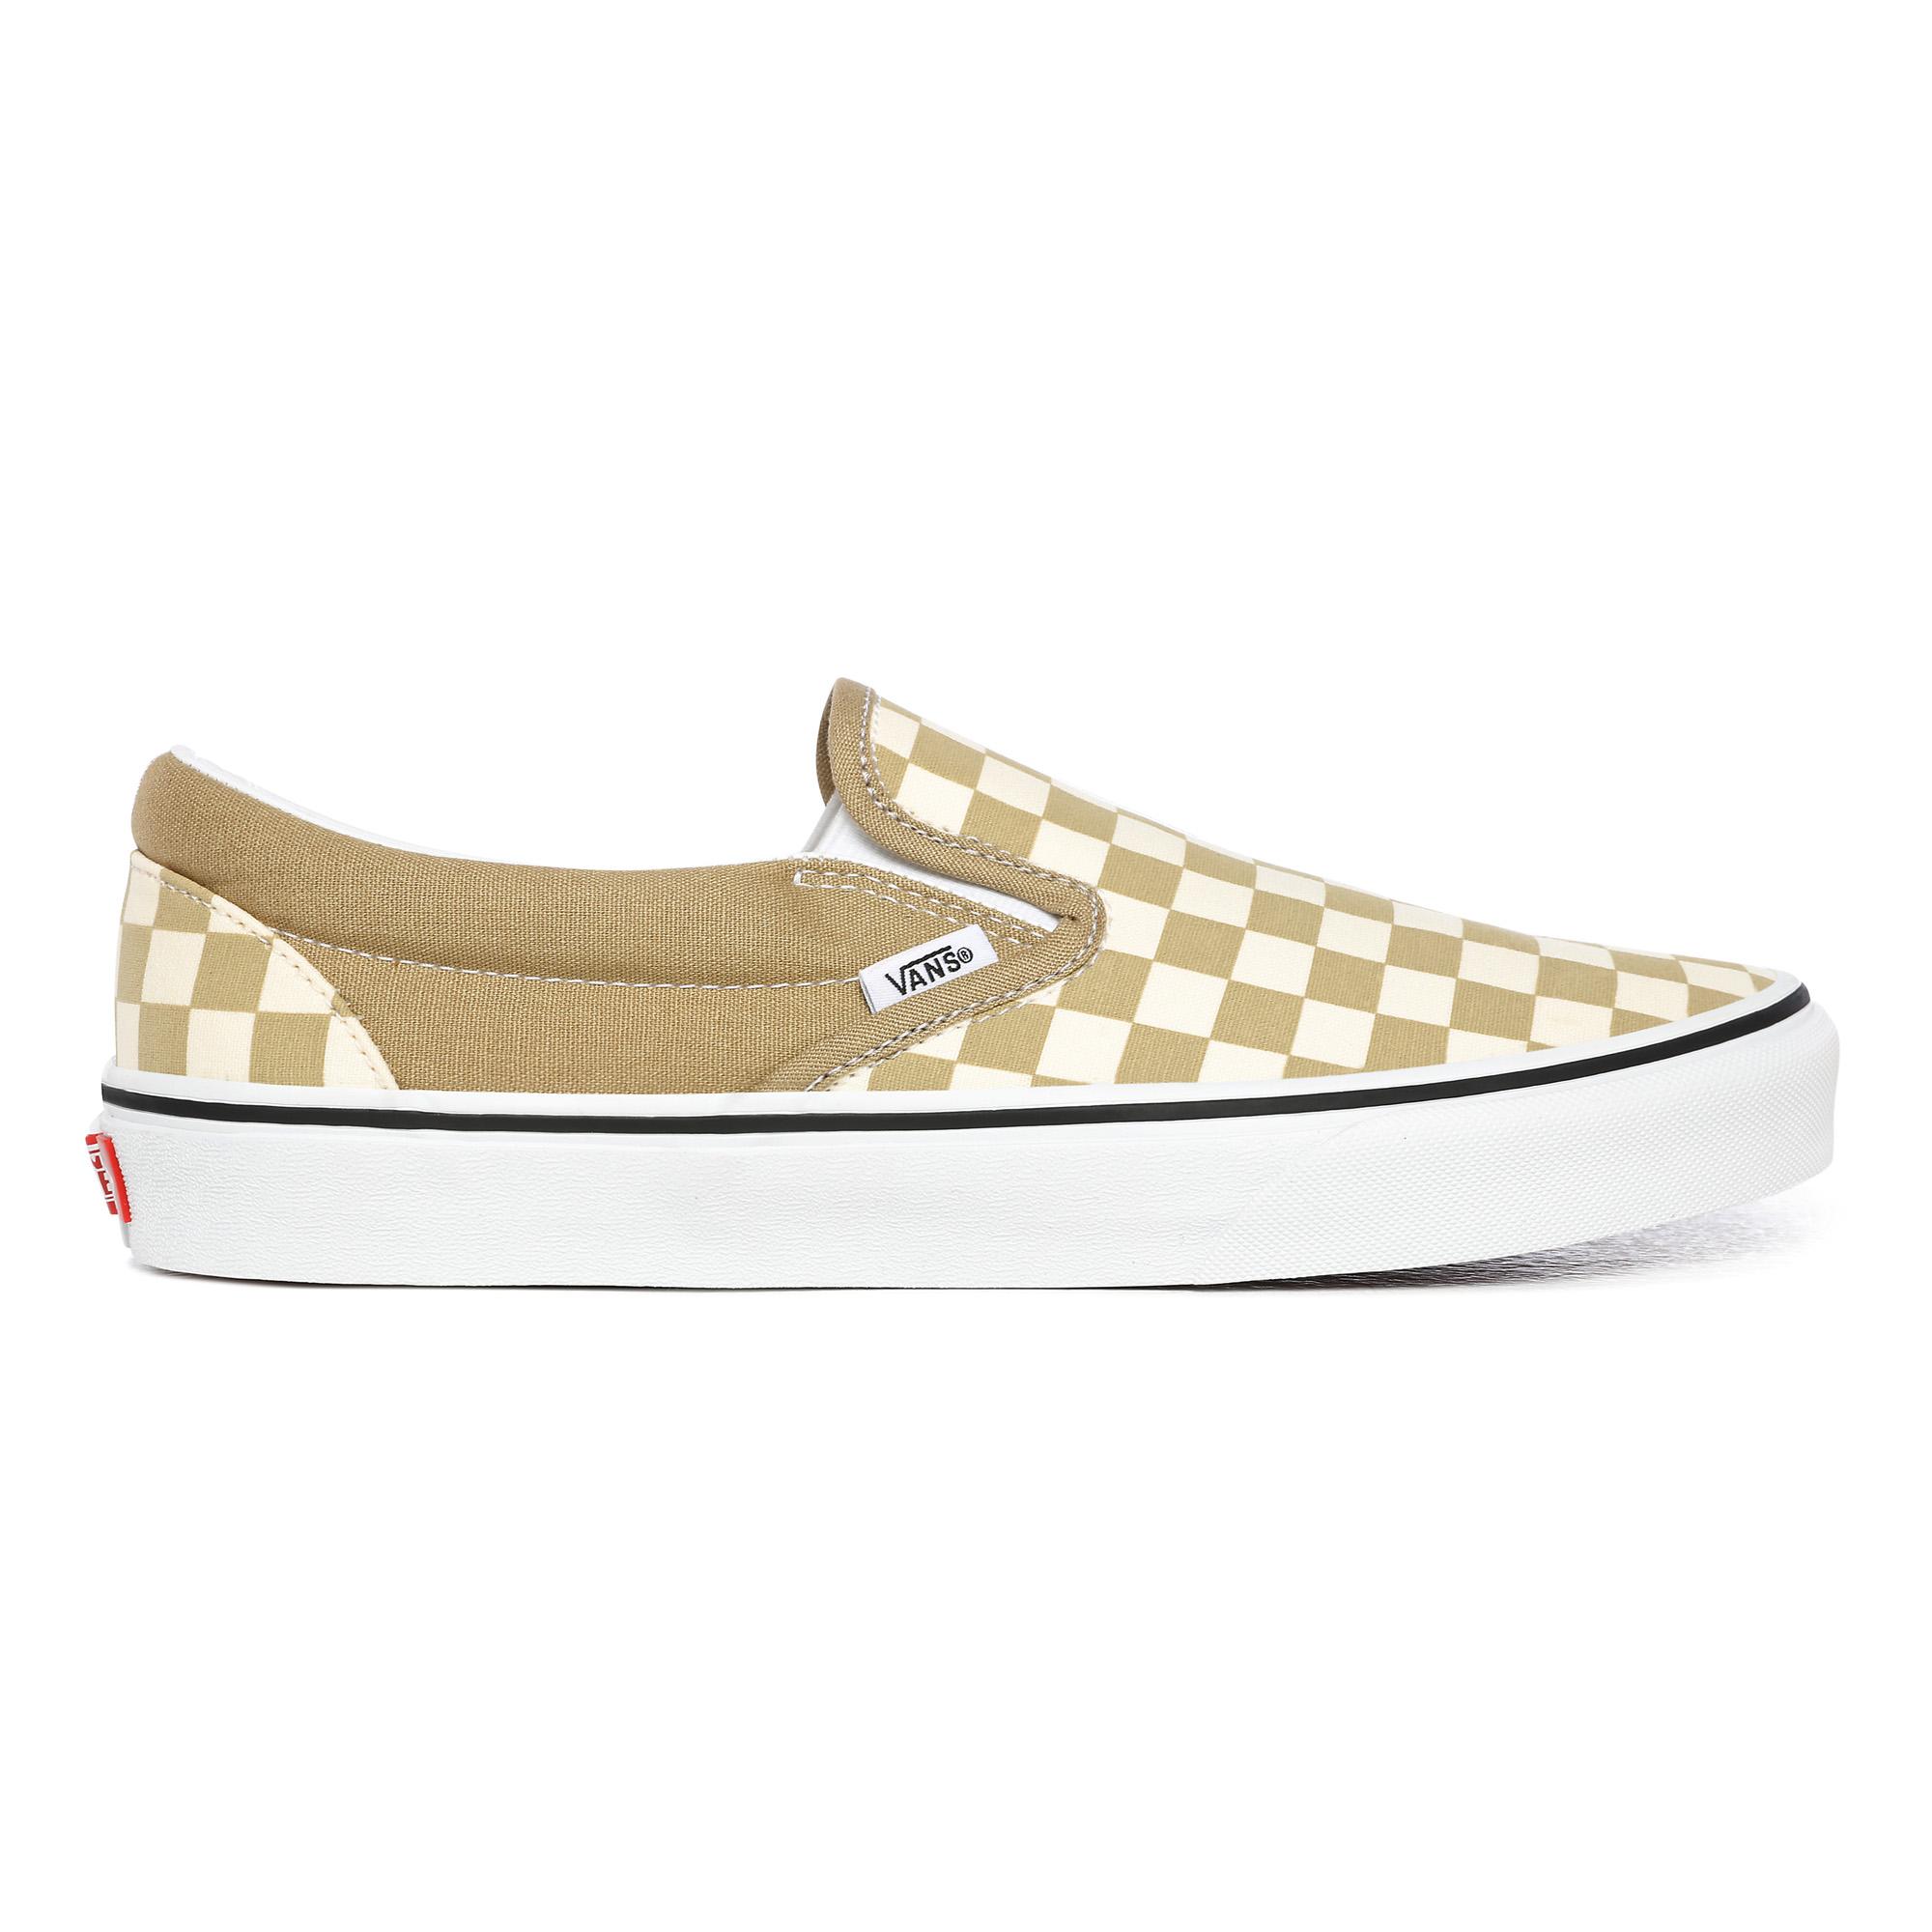 Vans Checkerboard Classic Slip-On sneakers, corn, 46